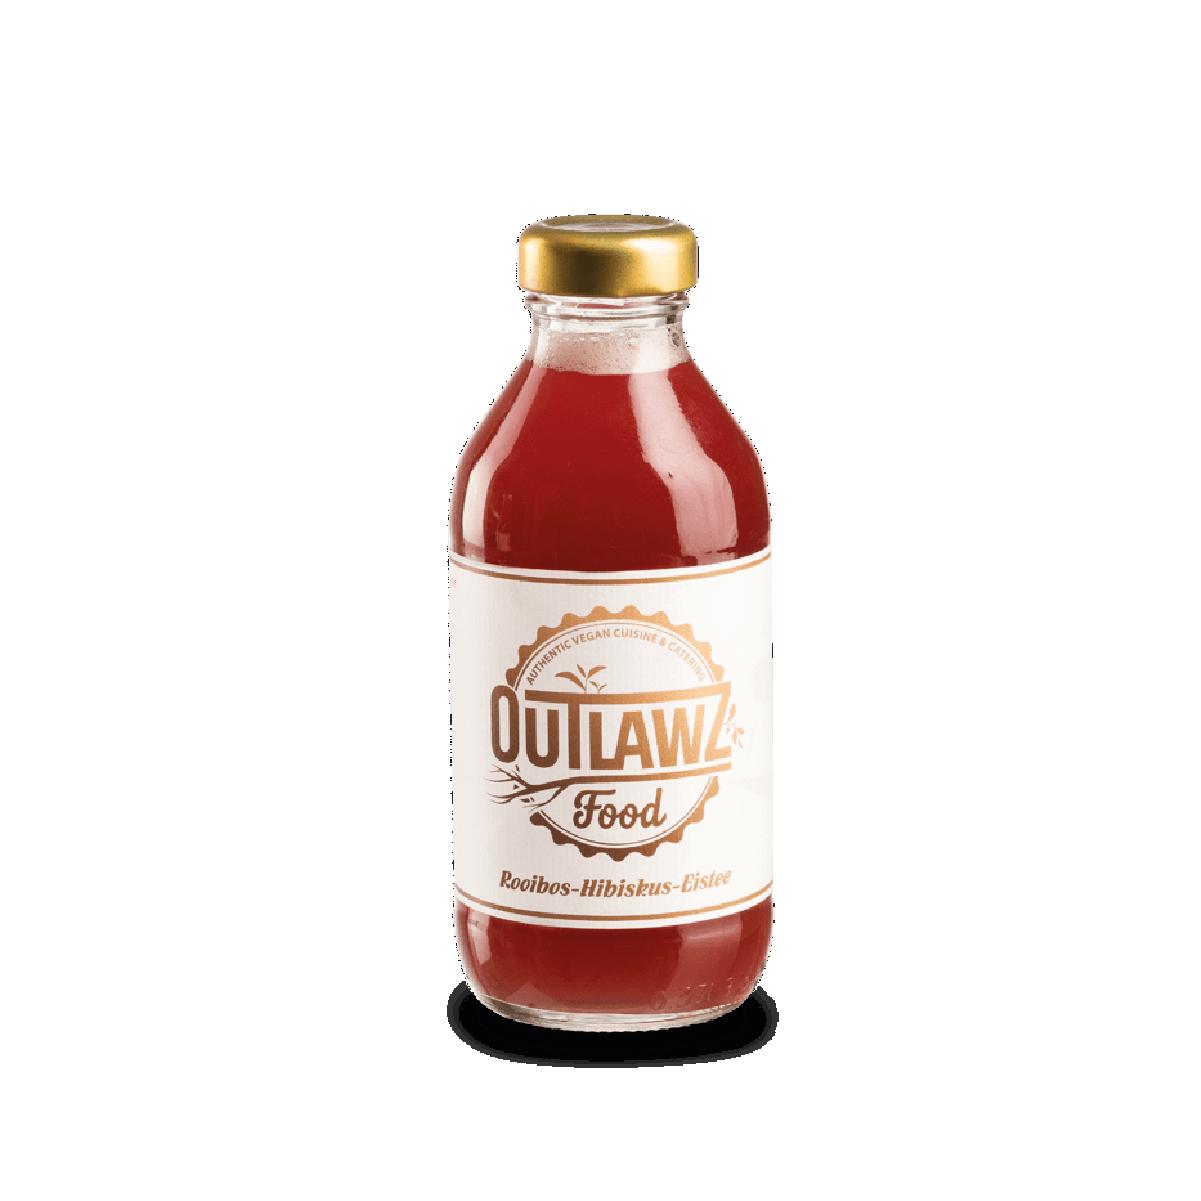 Outlawz Rooibos-Hibiskus-Eistee